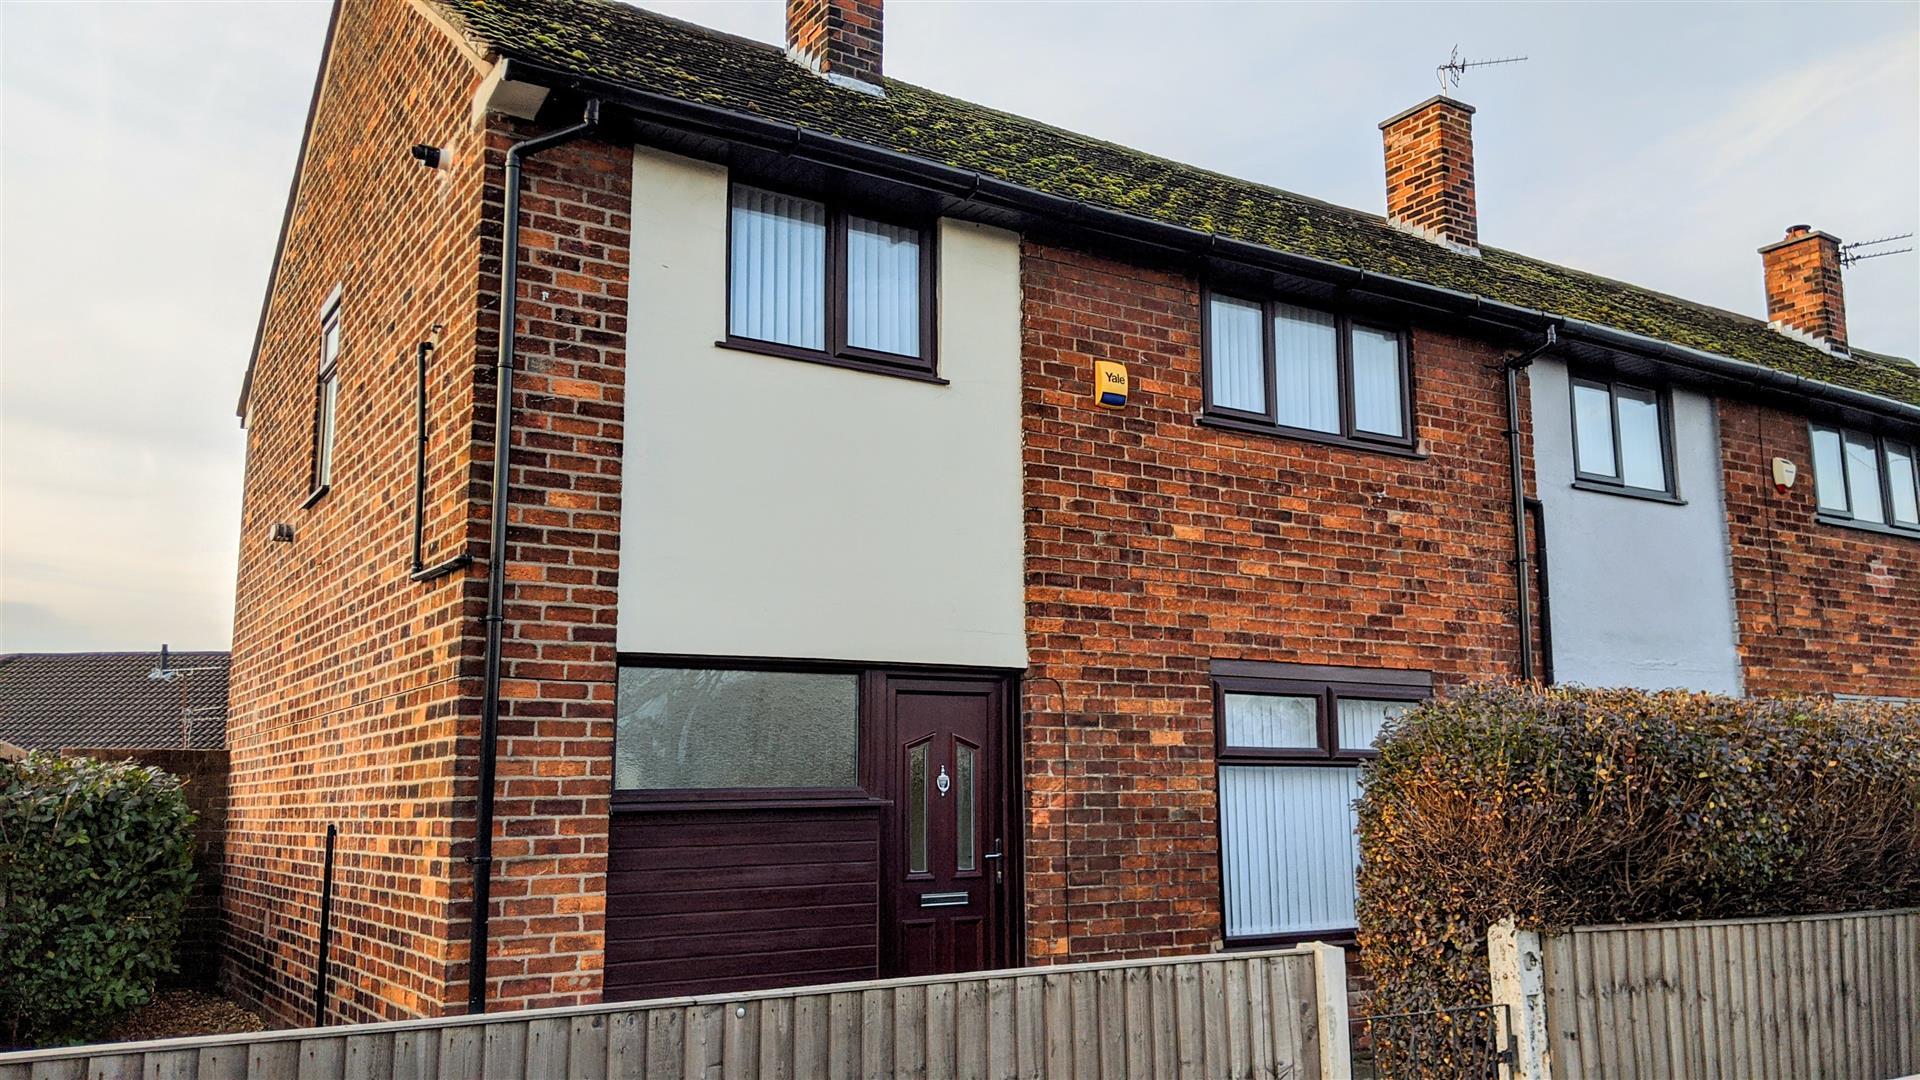 3 Bedrooms, House - End Terrace, Walton Lane, Liverpool